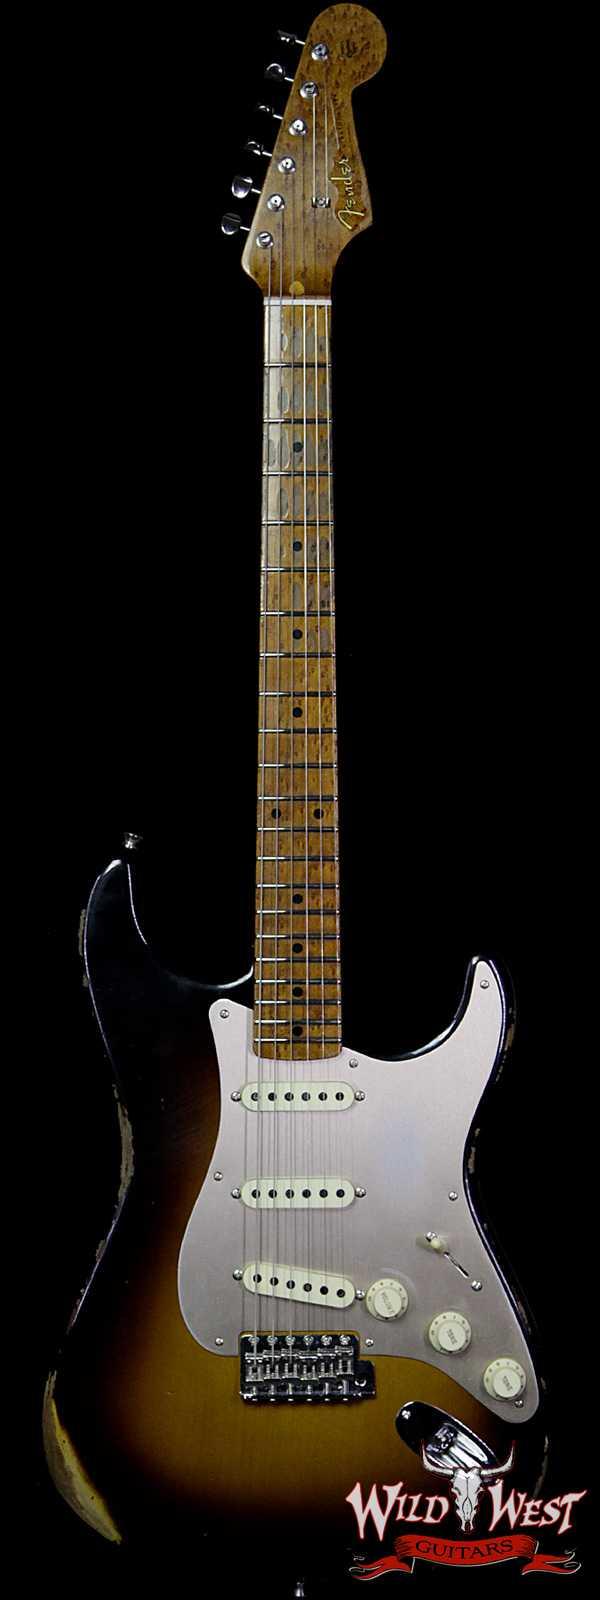 Fender Custom Shop Roasted 1956 Stratocaster Relic AAA Birdseye Maple Neck 2 Tone Sunburst